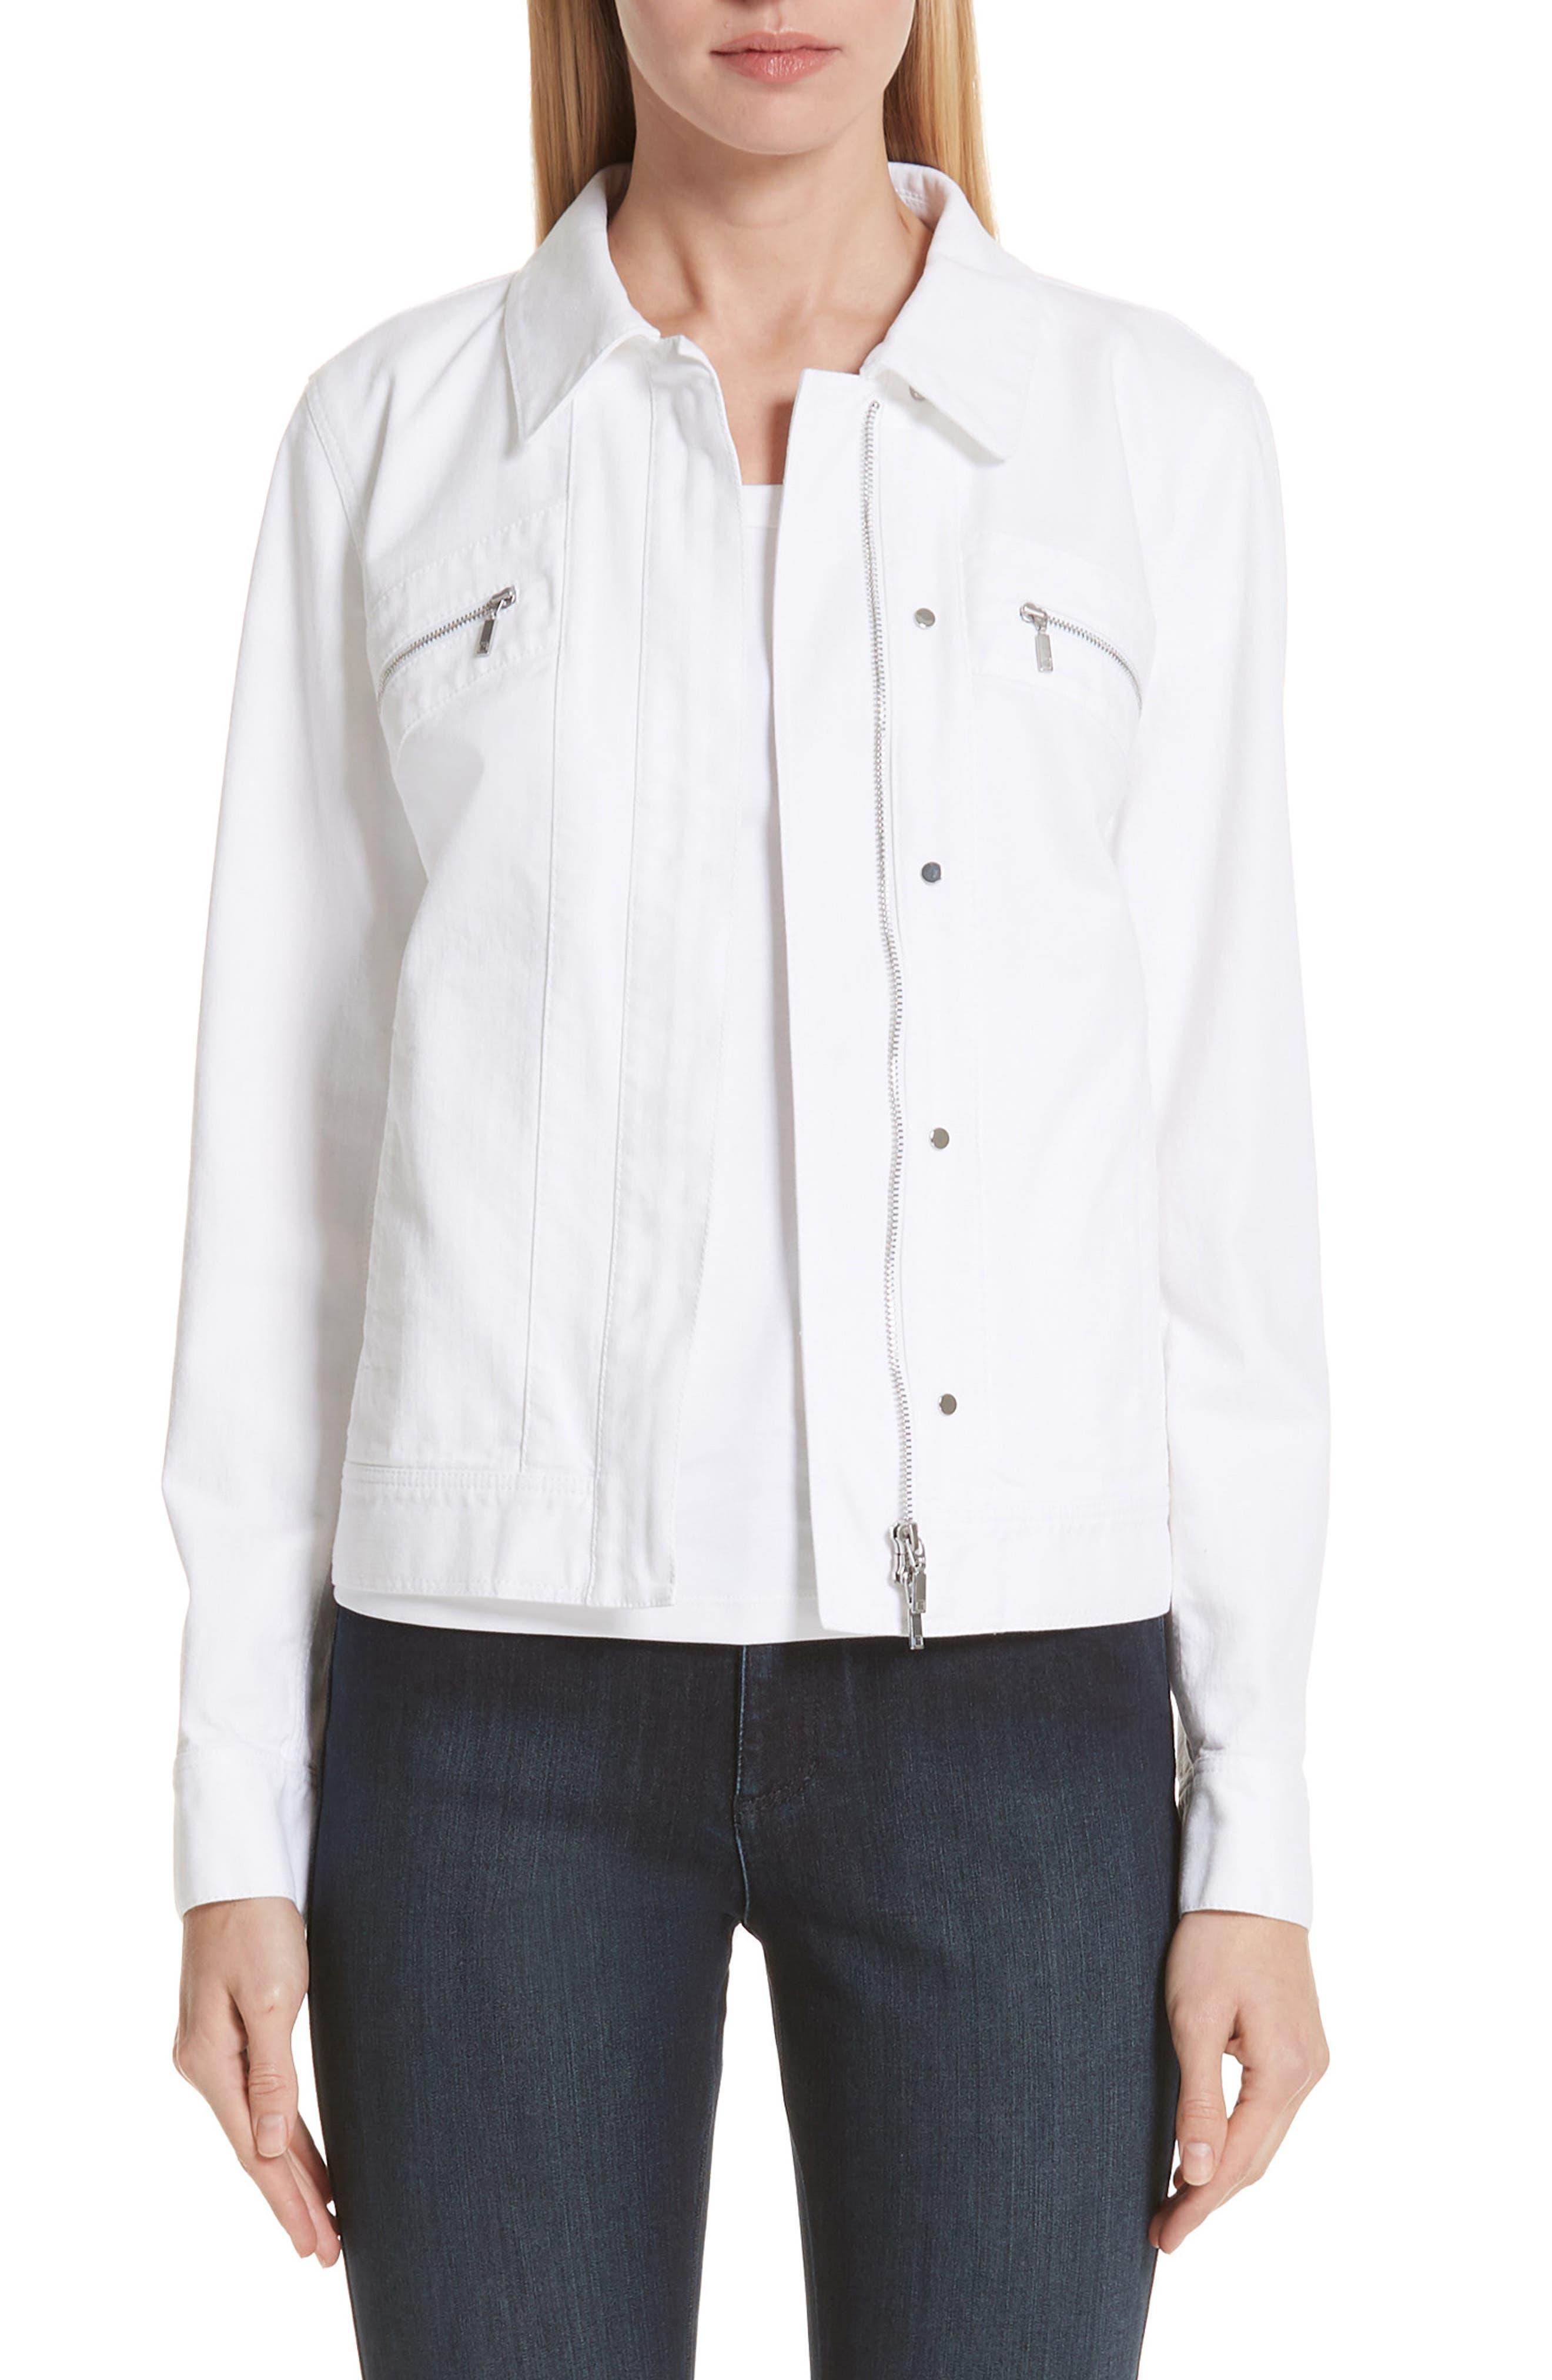 Kesha Denim Jacket,                             Main thumbnail 1, color,                             WHITE